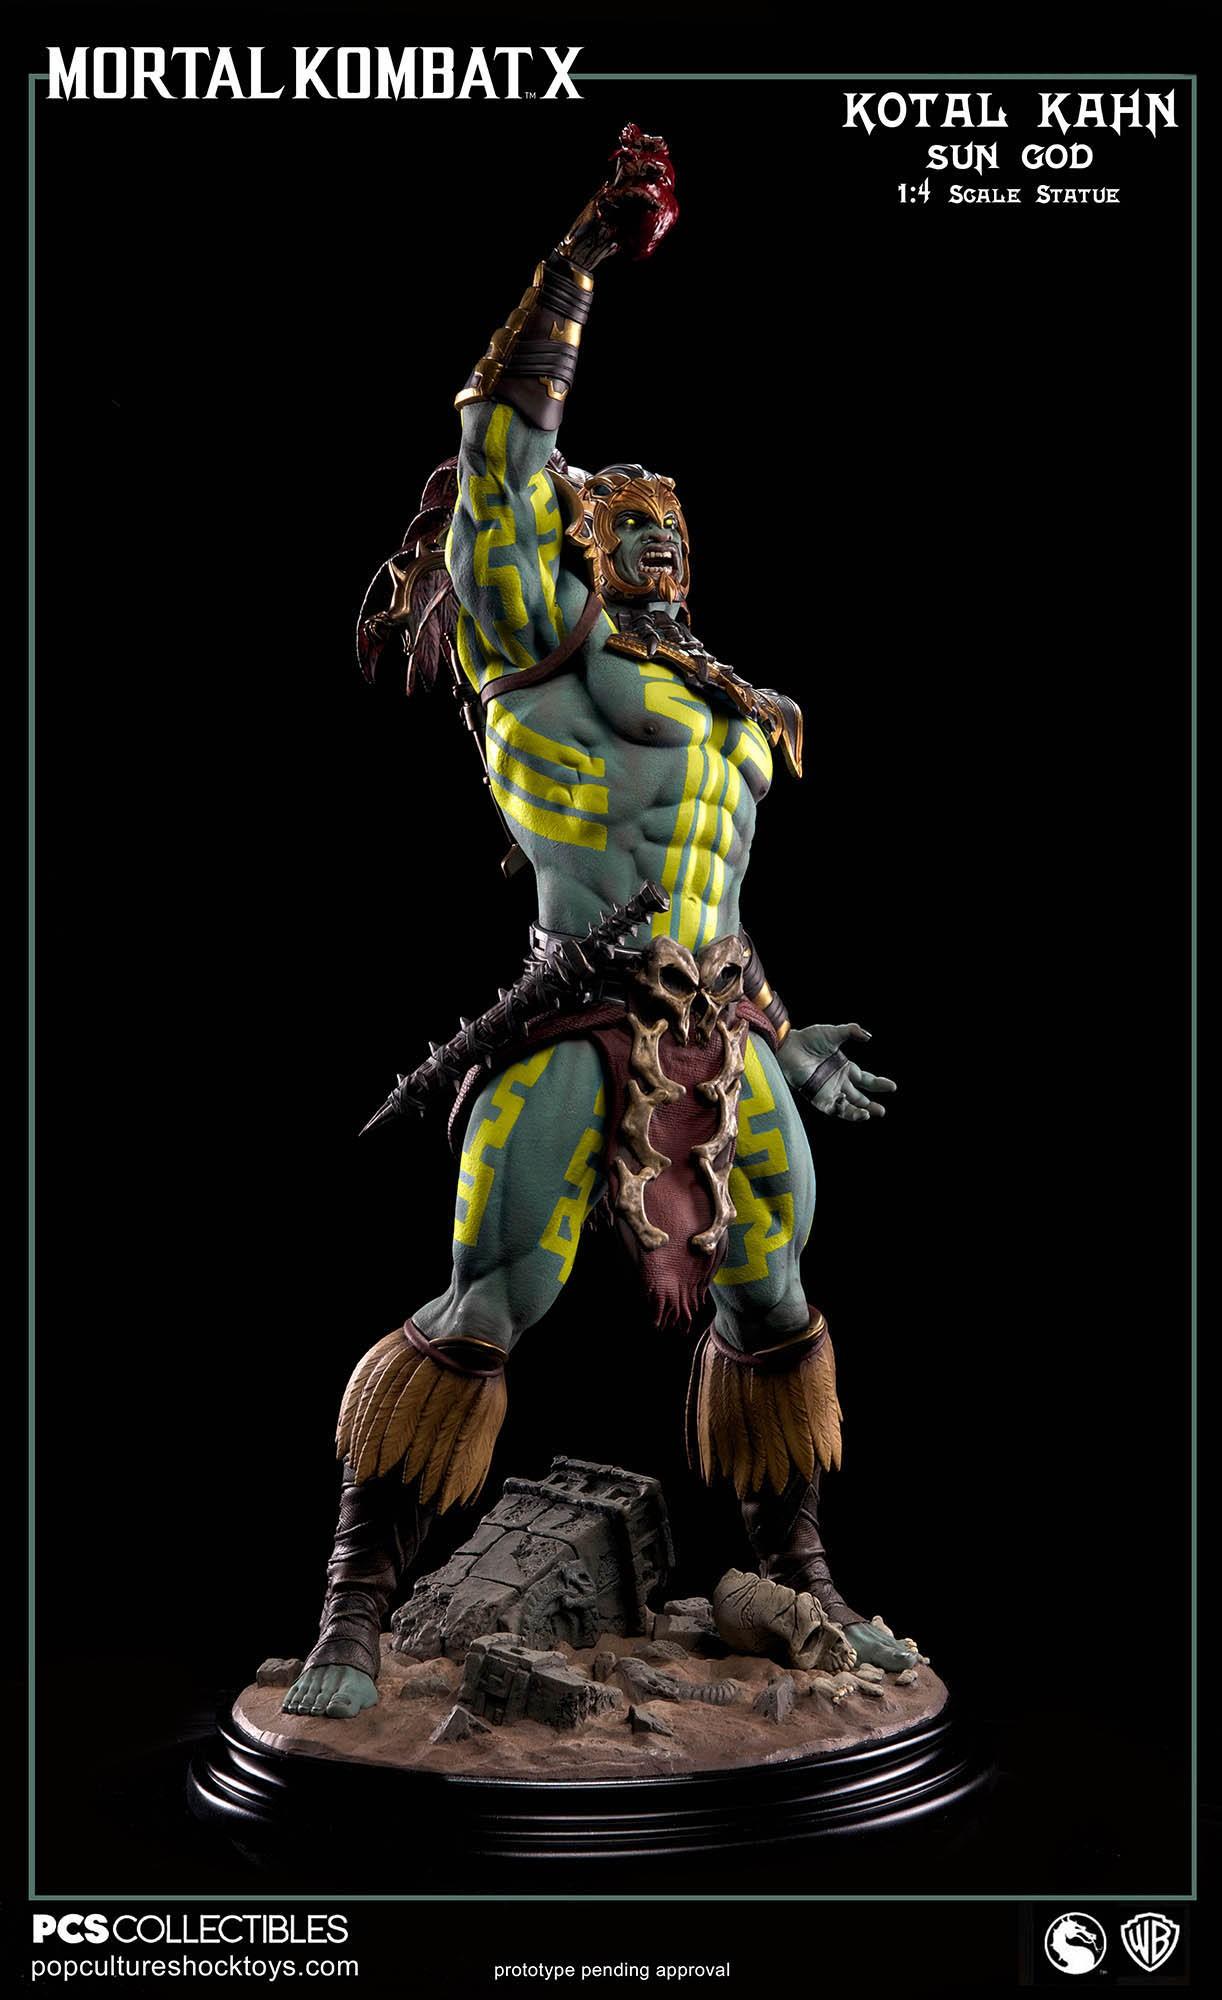 [Pop Culture Shock] Mortal Kombat X: Kotal Kahn 1:4 scale PCS-Kotal-Kahn-Sun-God-008